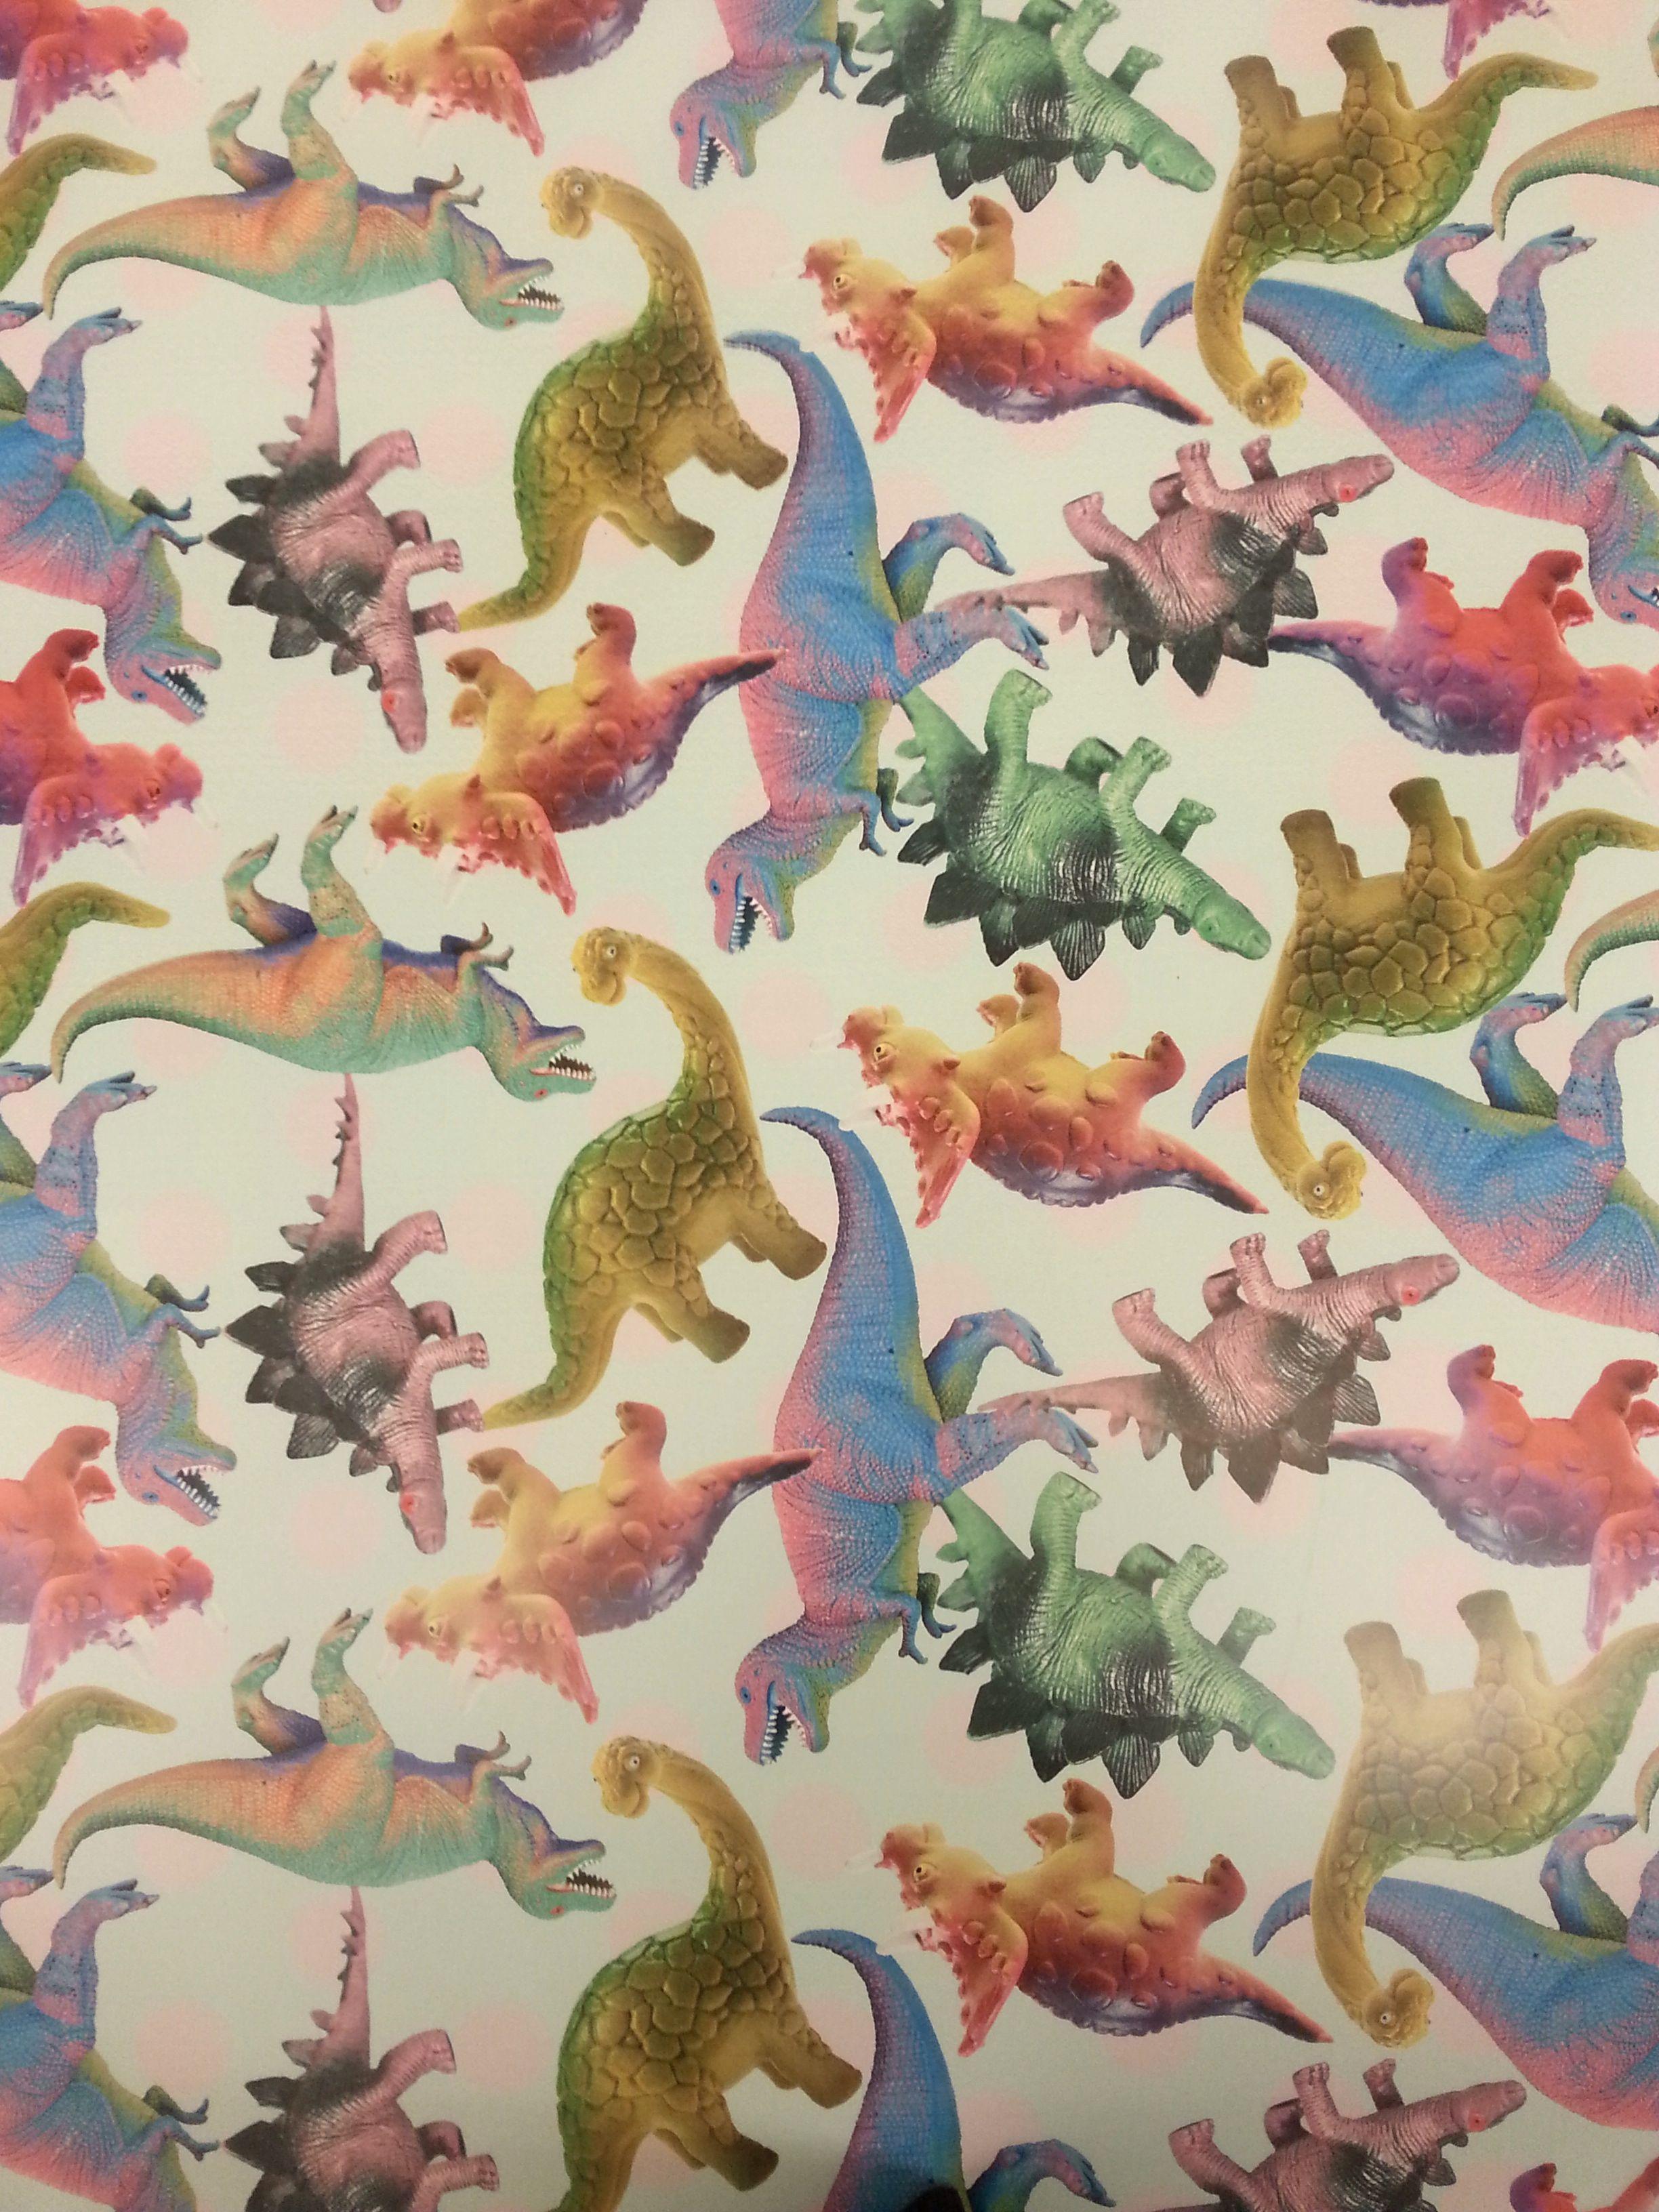 Dinosaur wallpaper wall treatments pinterest wallpapers and dinosaurs - Paperboy dinosaur wallpaper ...